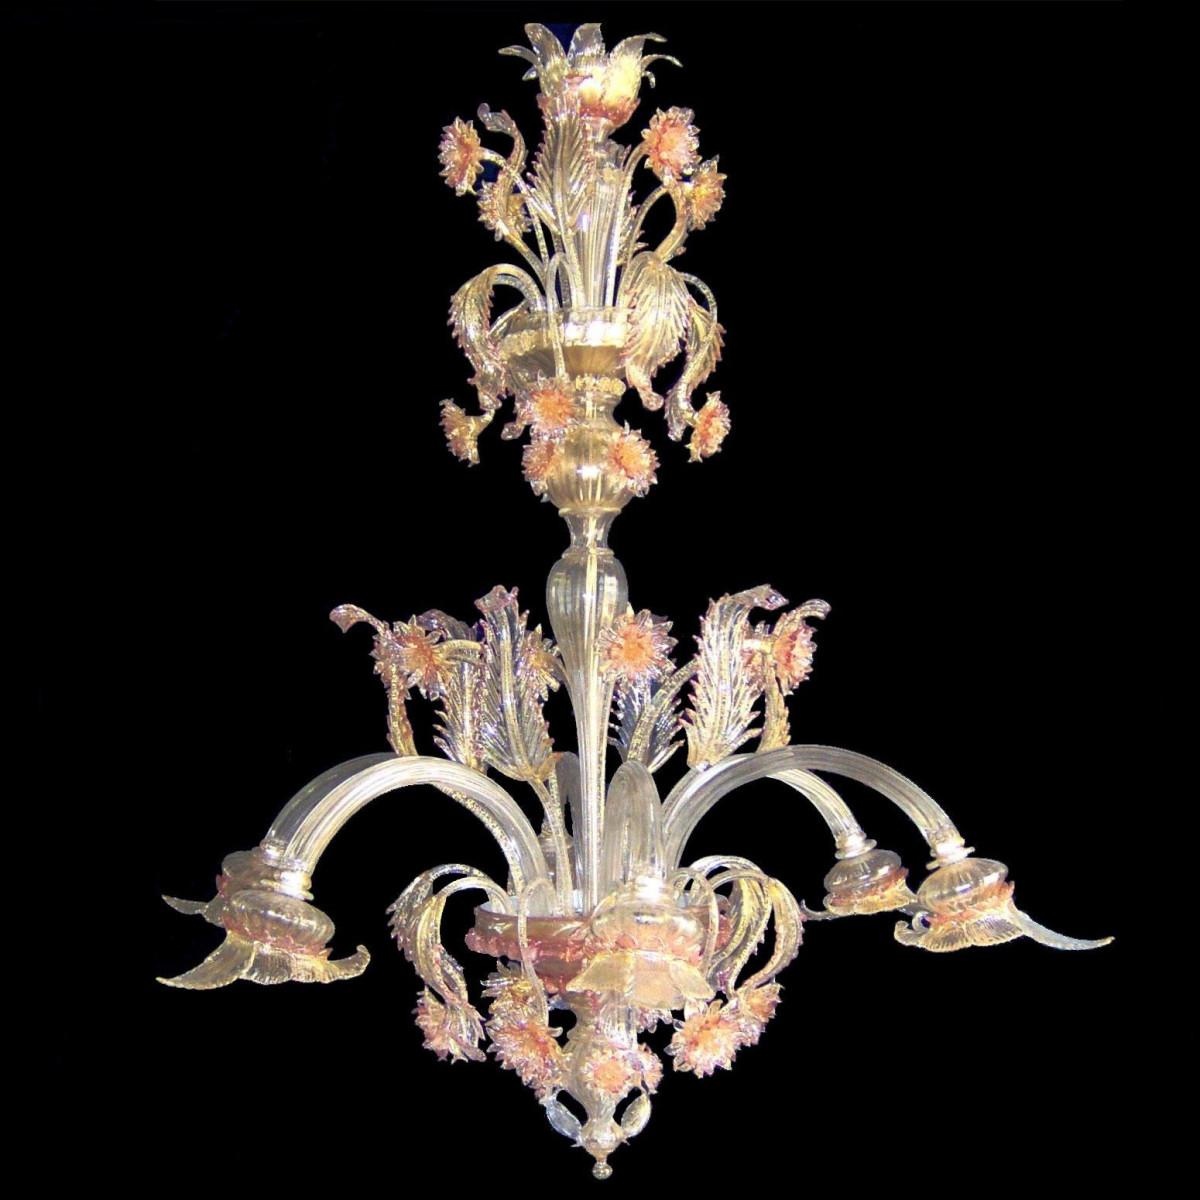 """Gisella"" Murano glas Kronleuchter - 6 flammig"